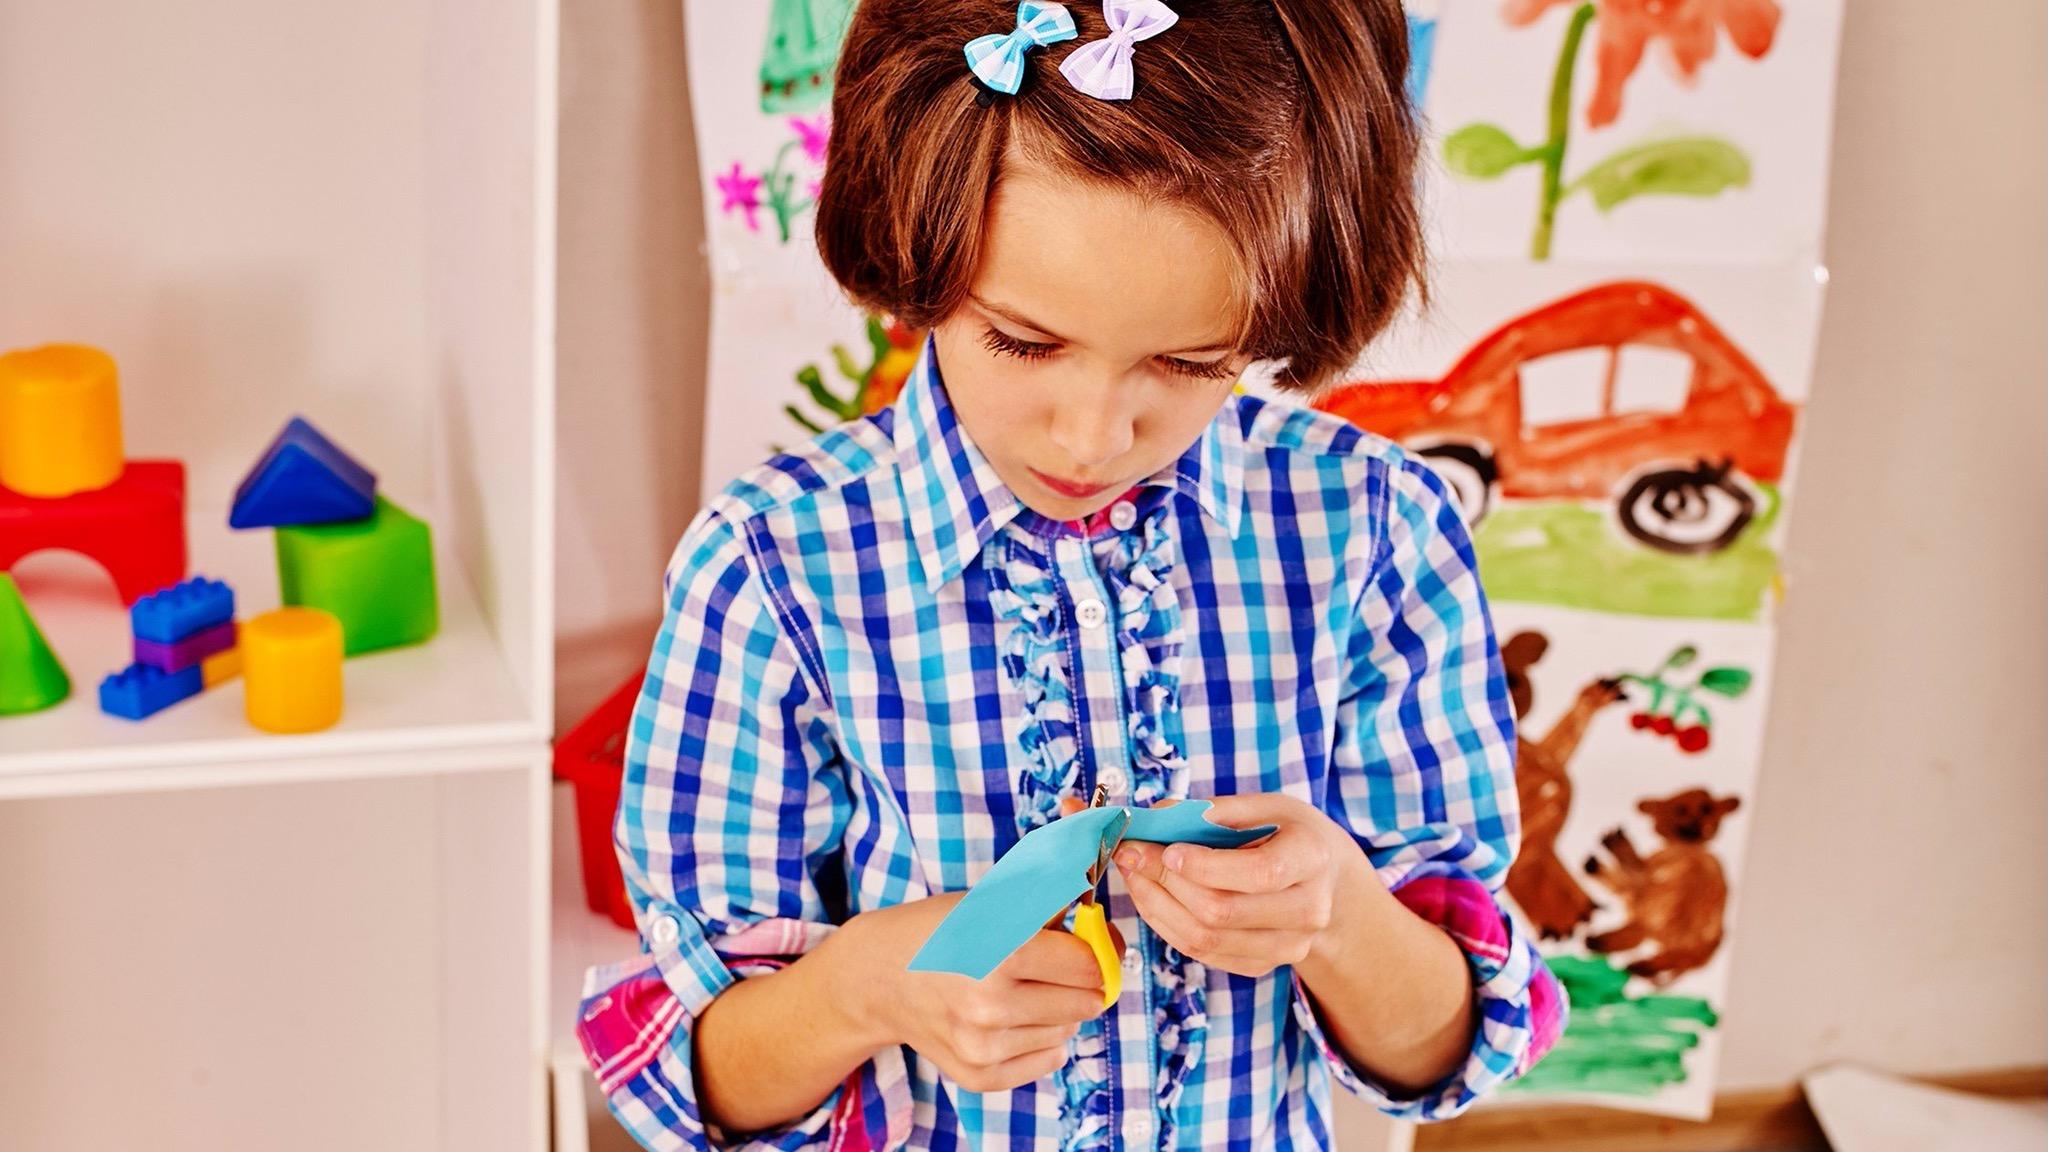 Child cutting coloured paper